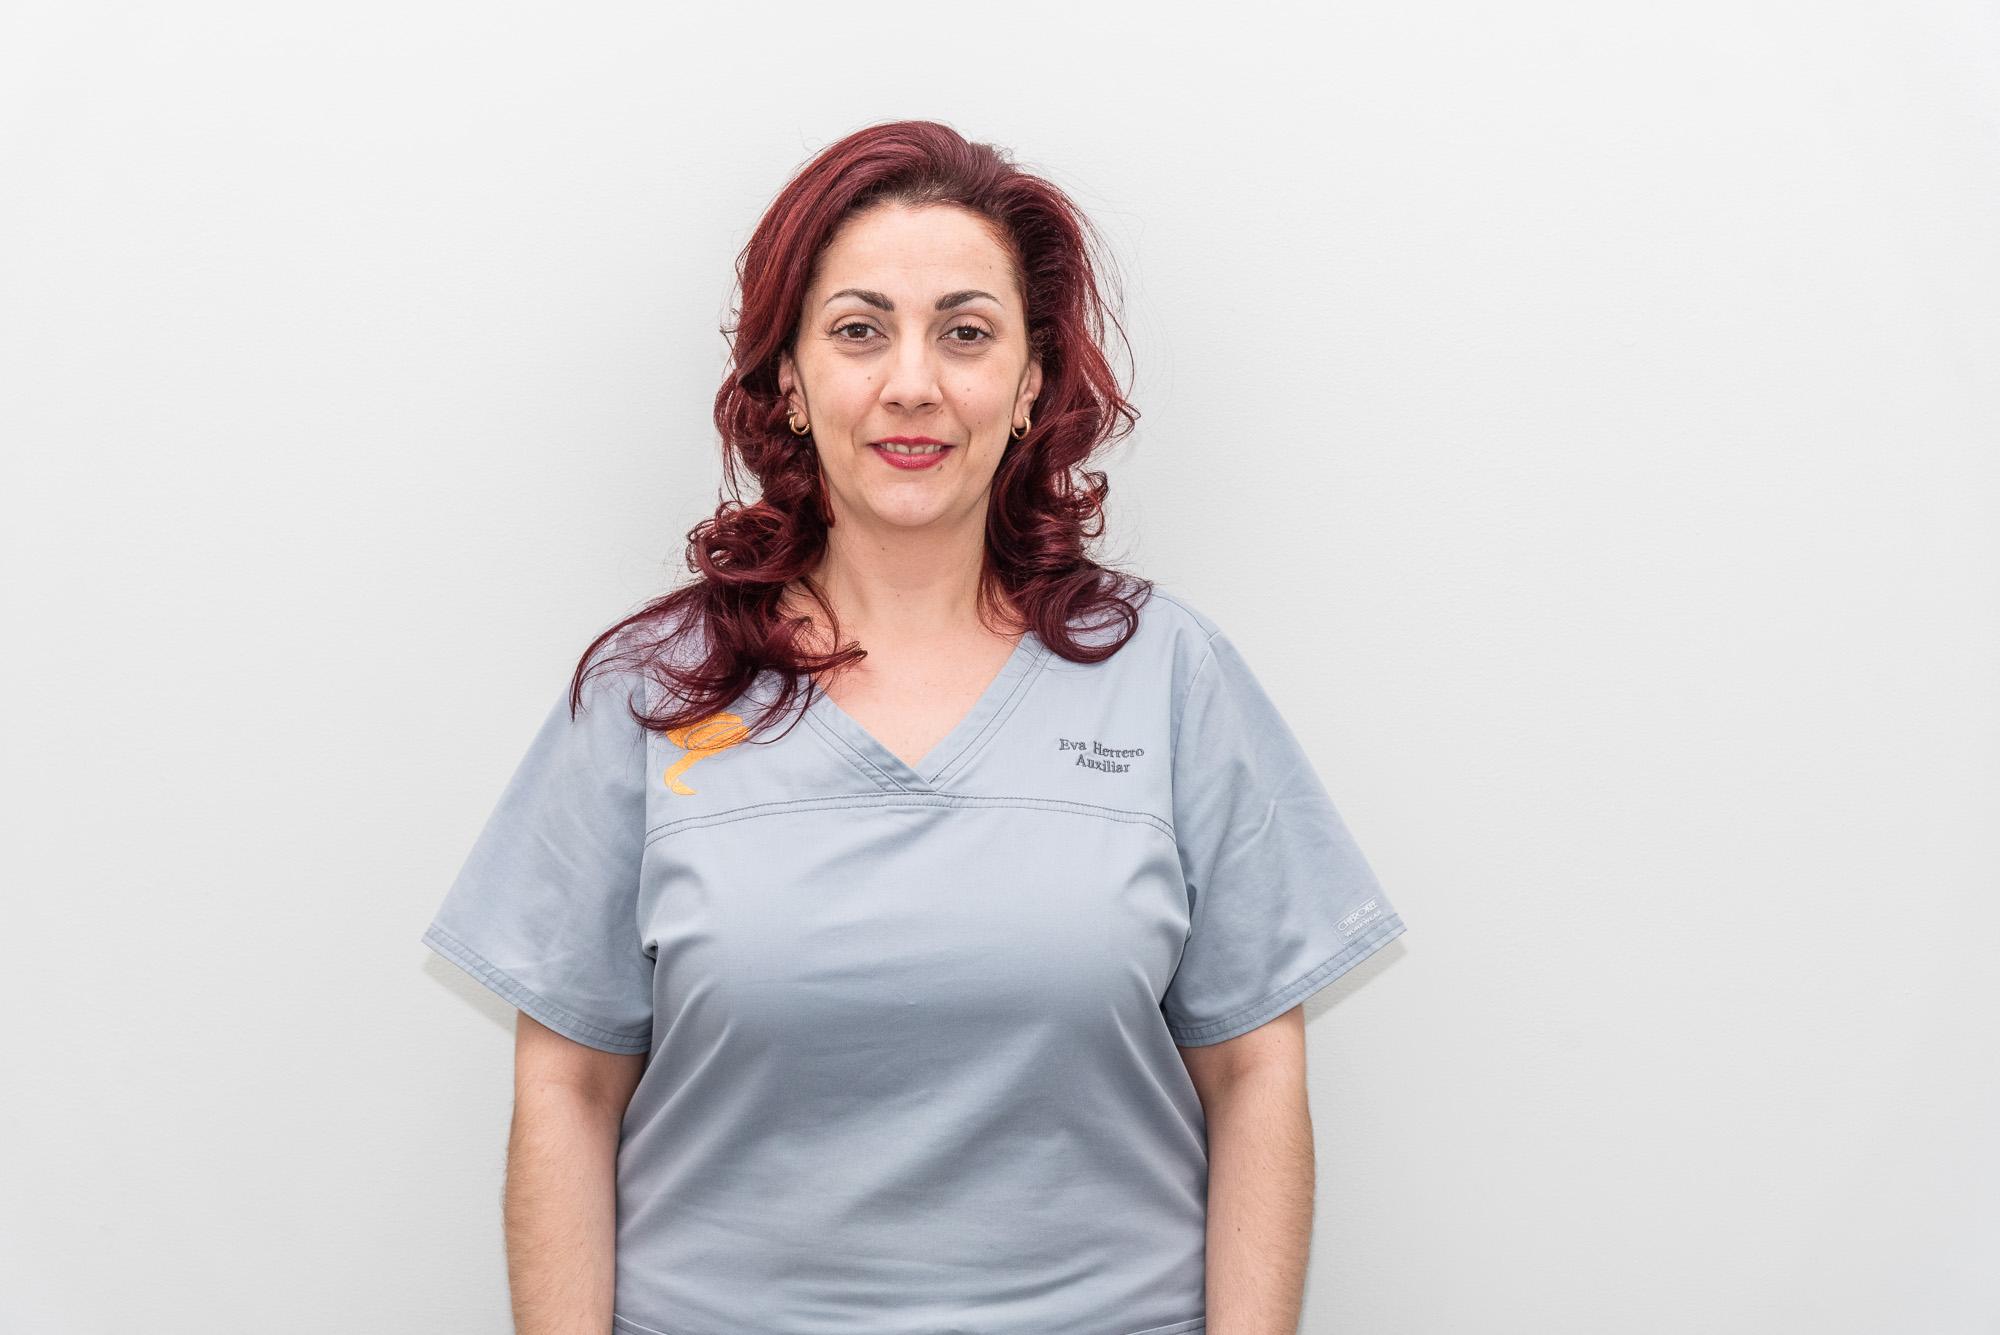 Dentista profesional en Serrano Clínica dental